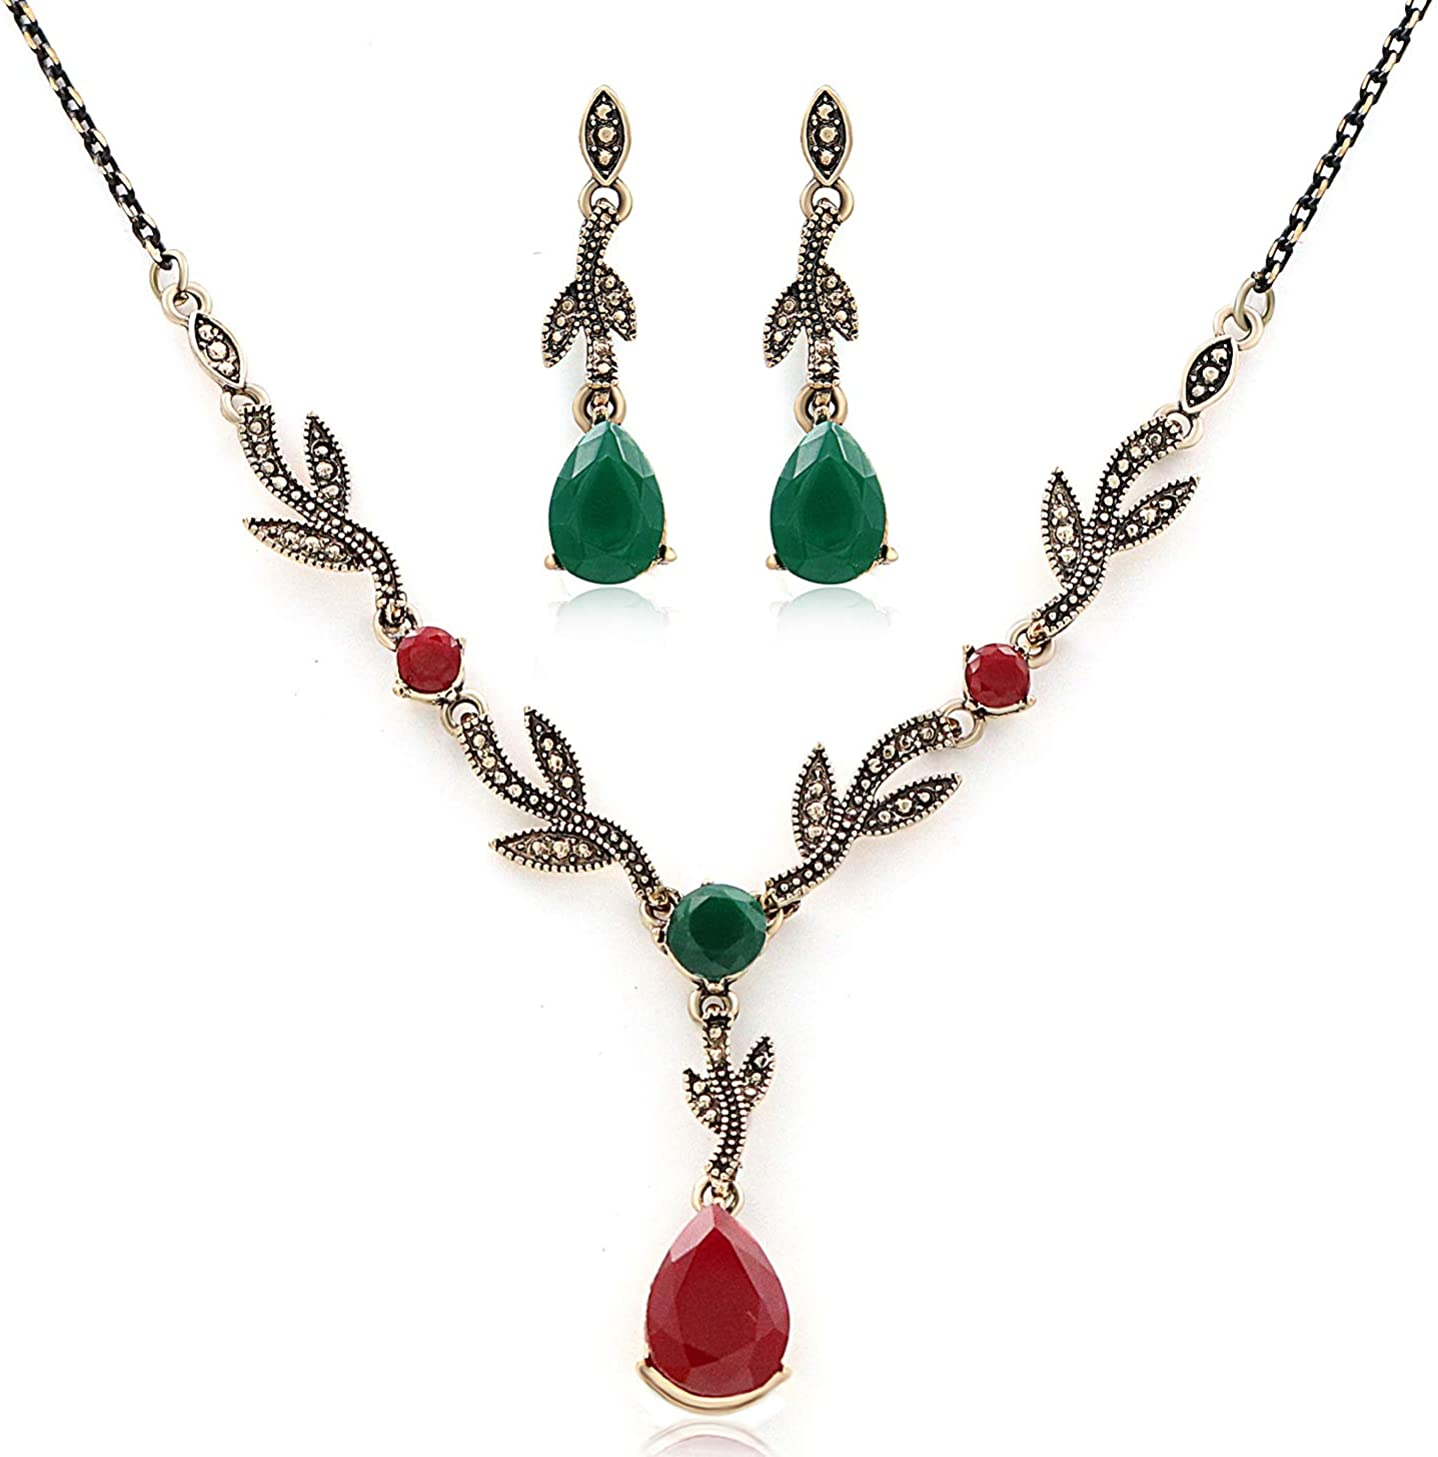 Chamqueen Resin Drop Pendant Crystal Jewelry Set Vintage Crystal Choker Necklace Retro Teardrop Earrings for Women